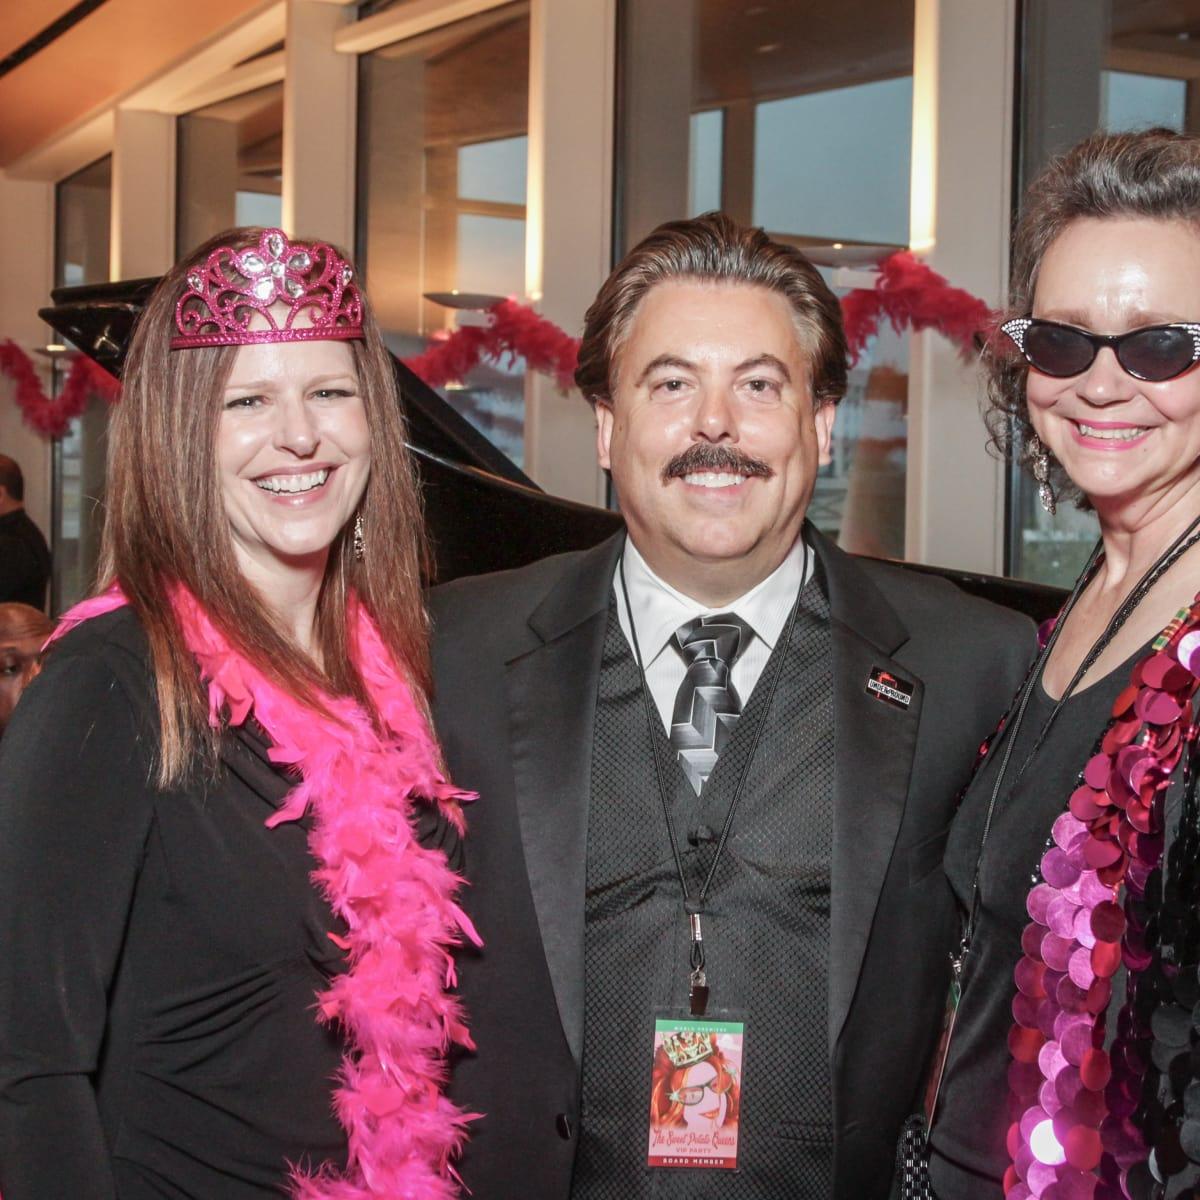 Tricia Ratliff, Alan Ratliff, Jill Conner Browne at Sweet Potato Queens party